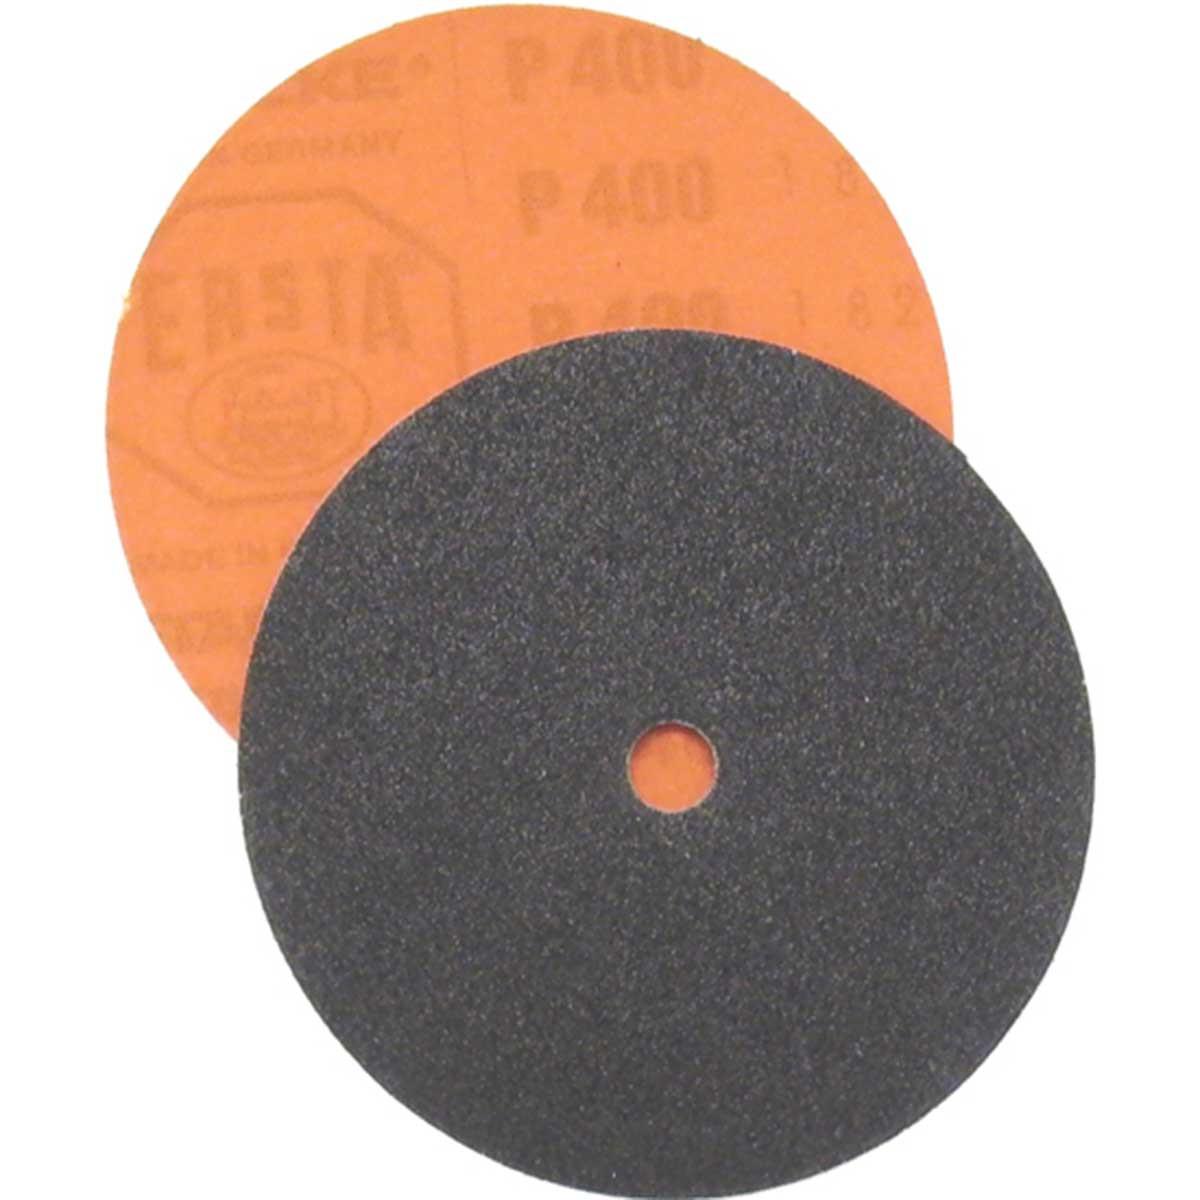 Starcke 4 Quot Sandpaper For Stone Polishing Contractors Direct